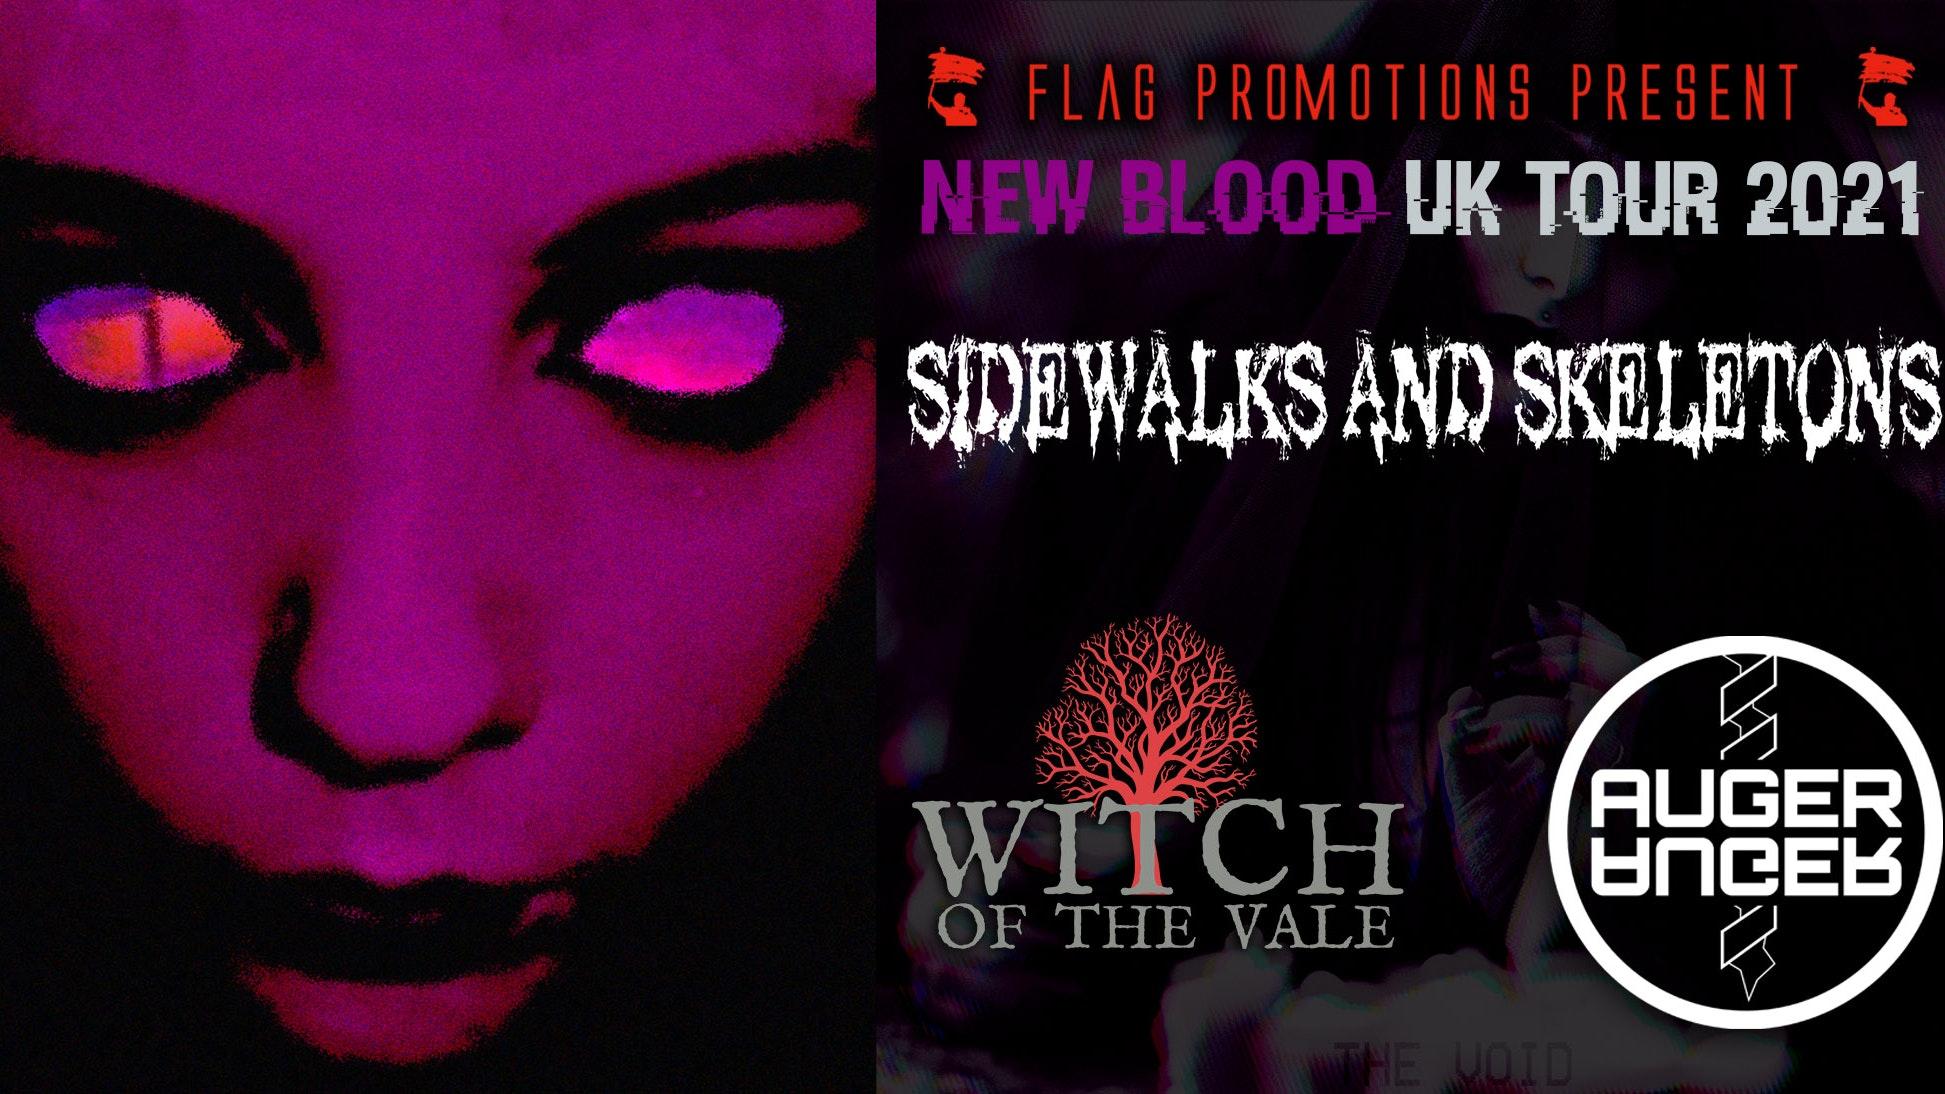 NEW BLOOD UK TOUR 2021